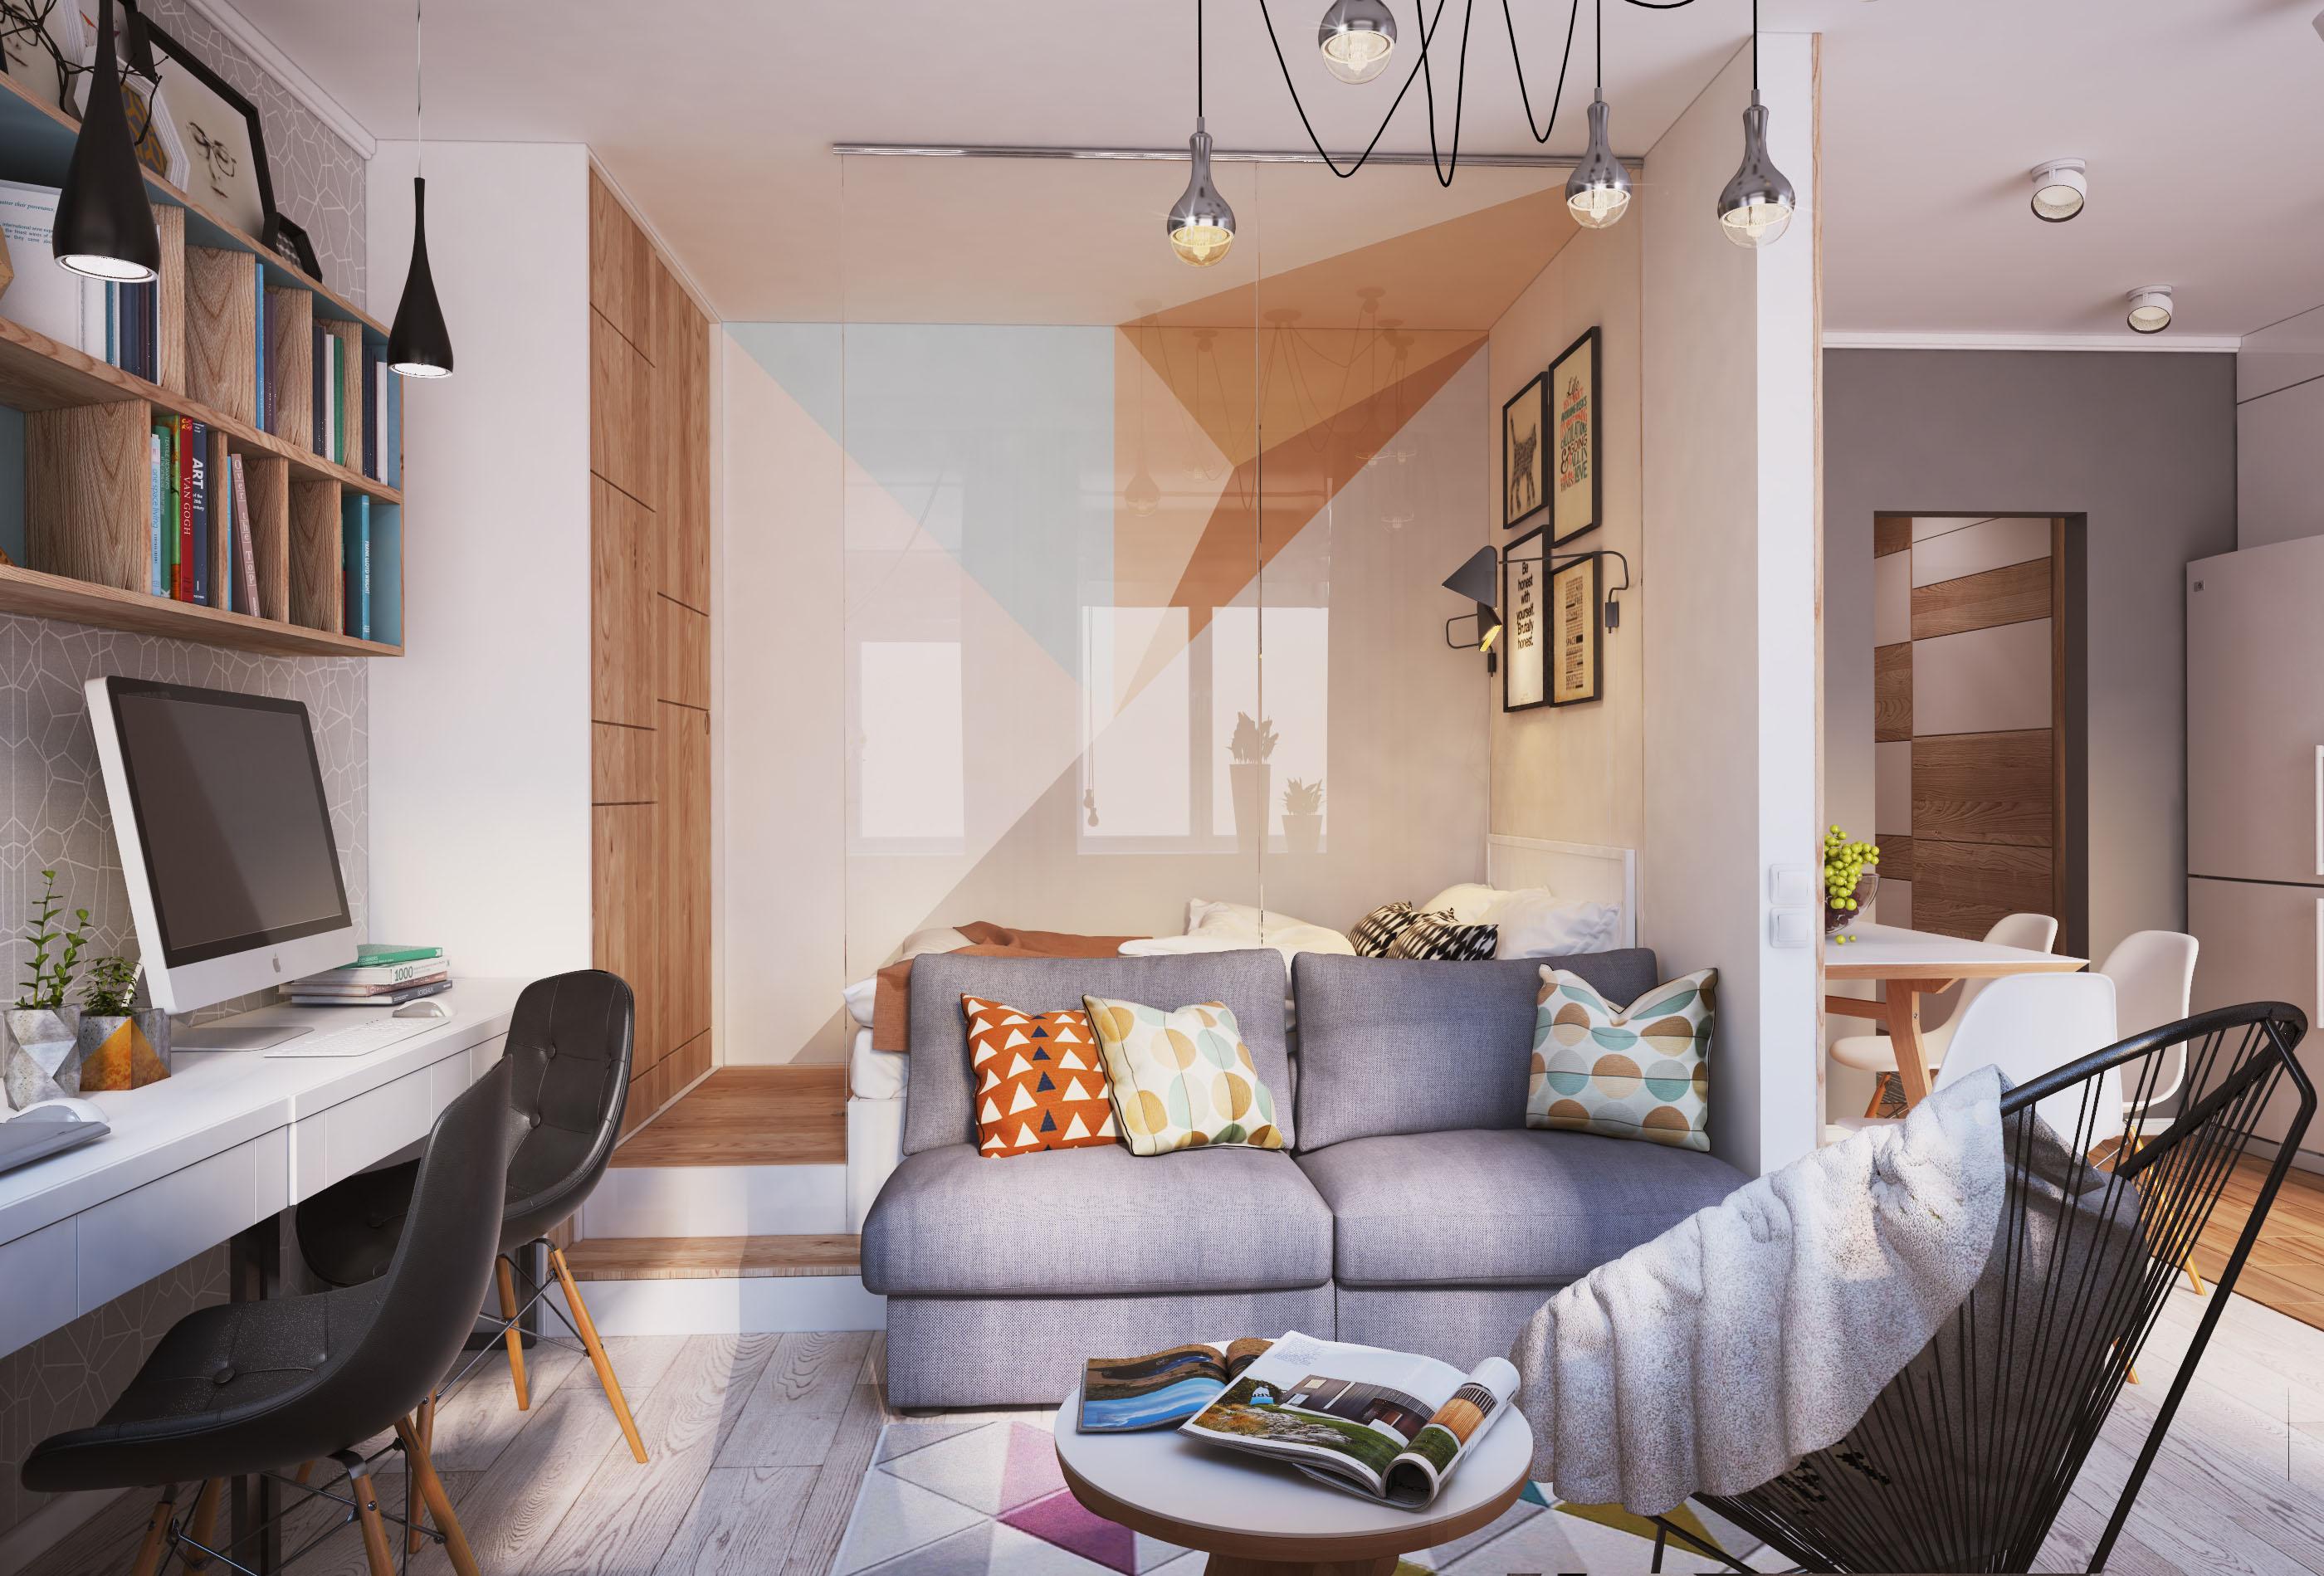 Дизайн интерьера квартира 40 кв м